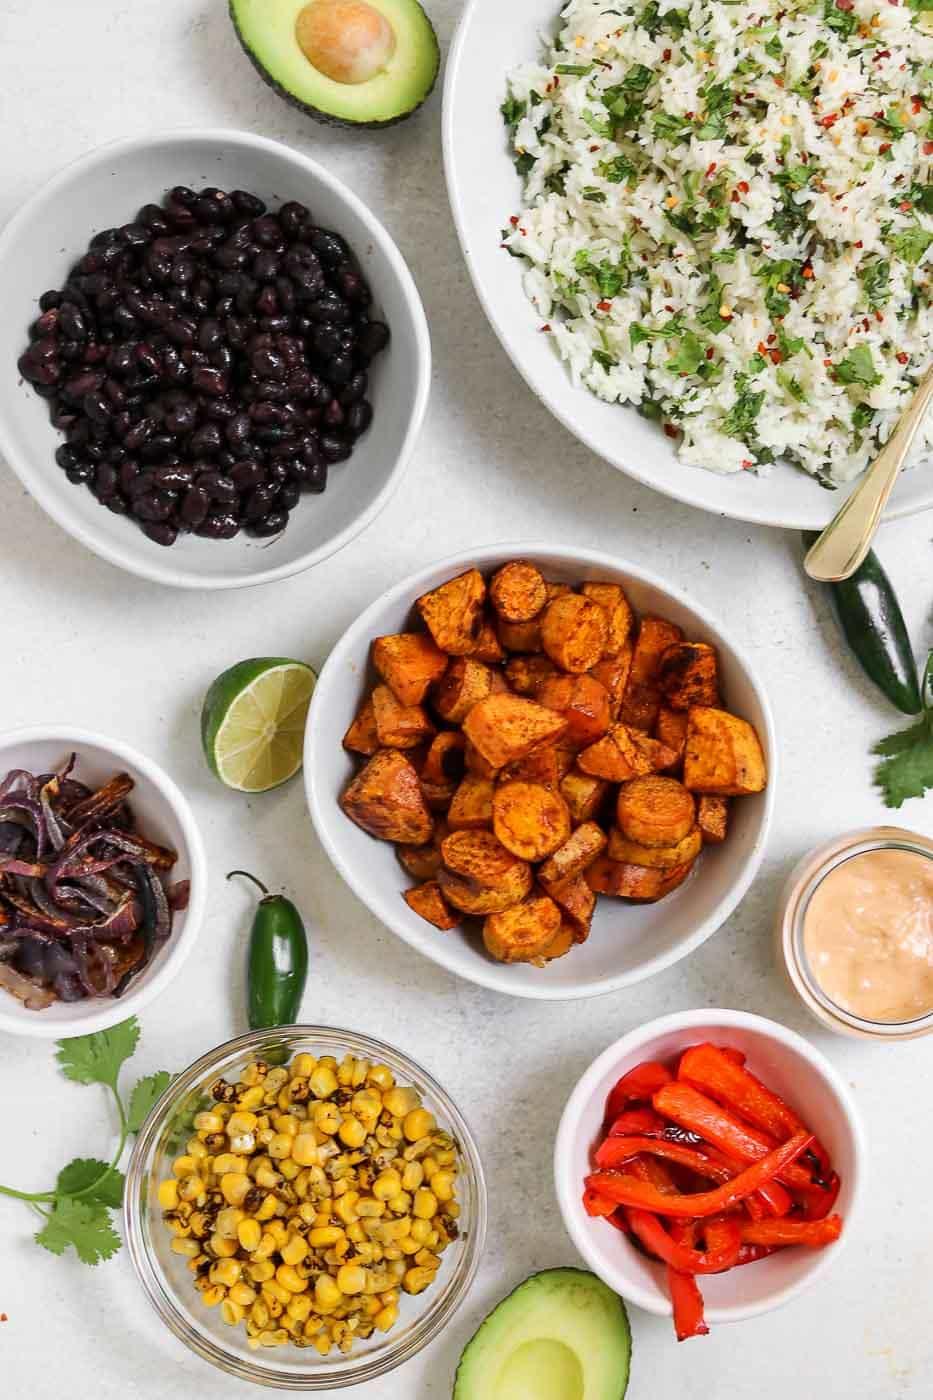 Ingredients for the vegan burrito bowl recipe in white bowls.